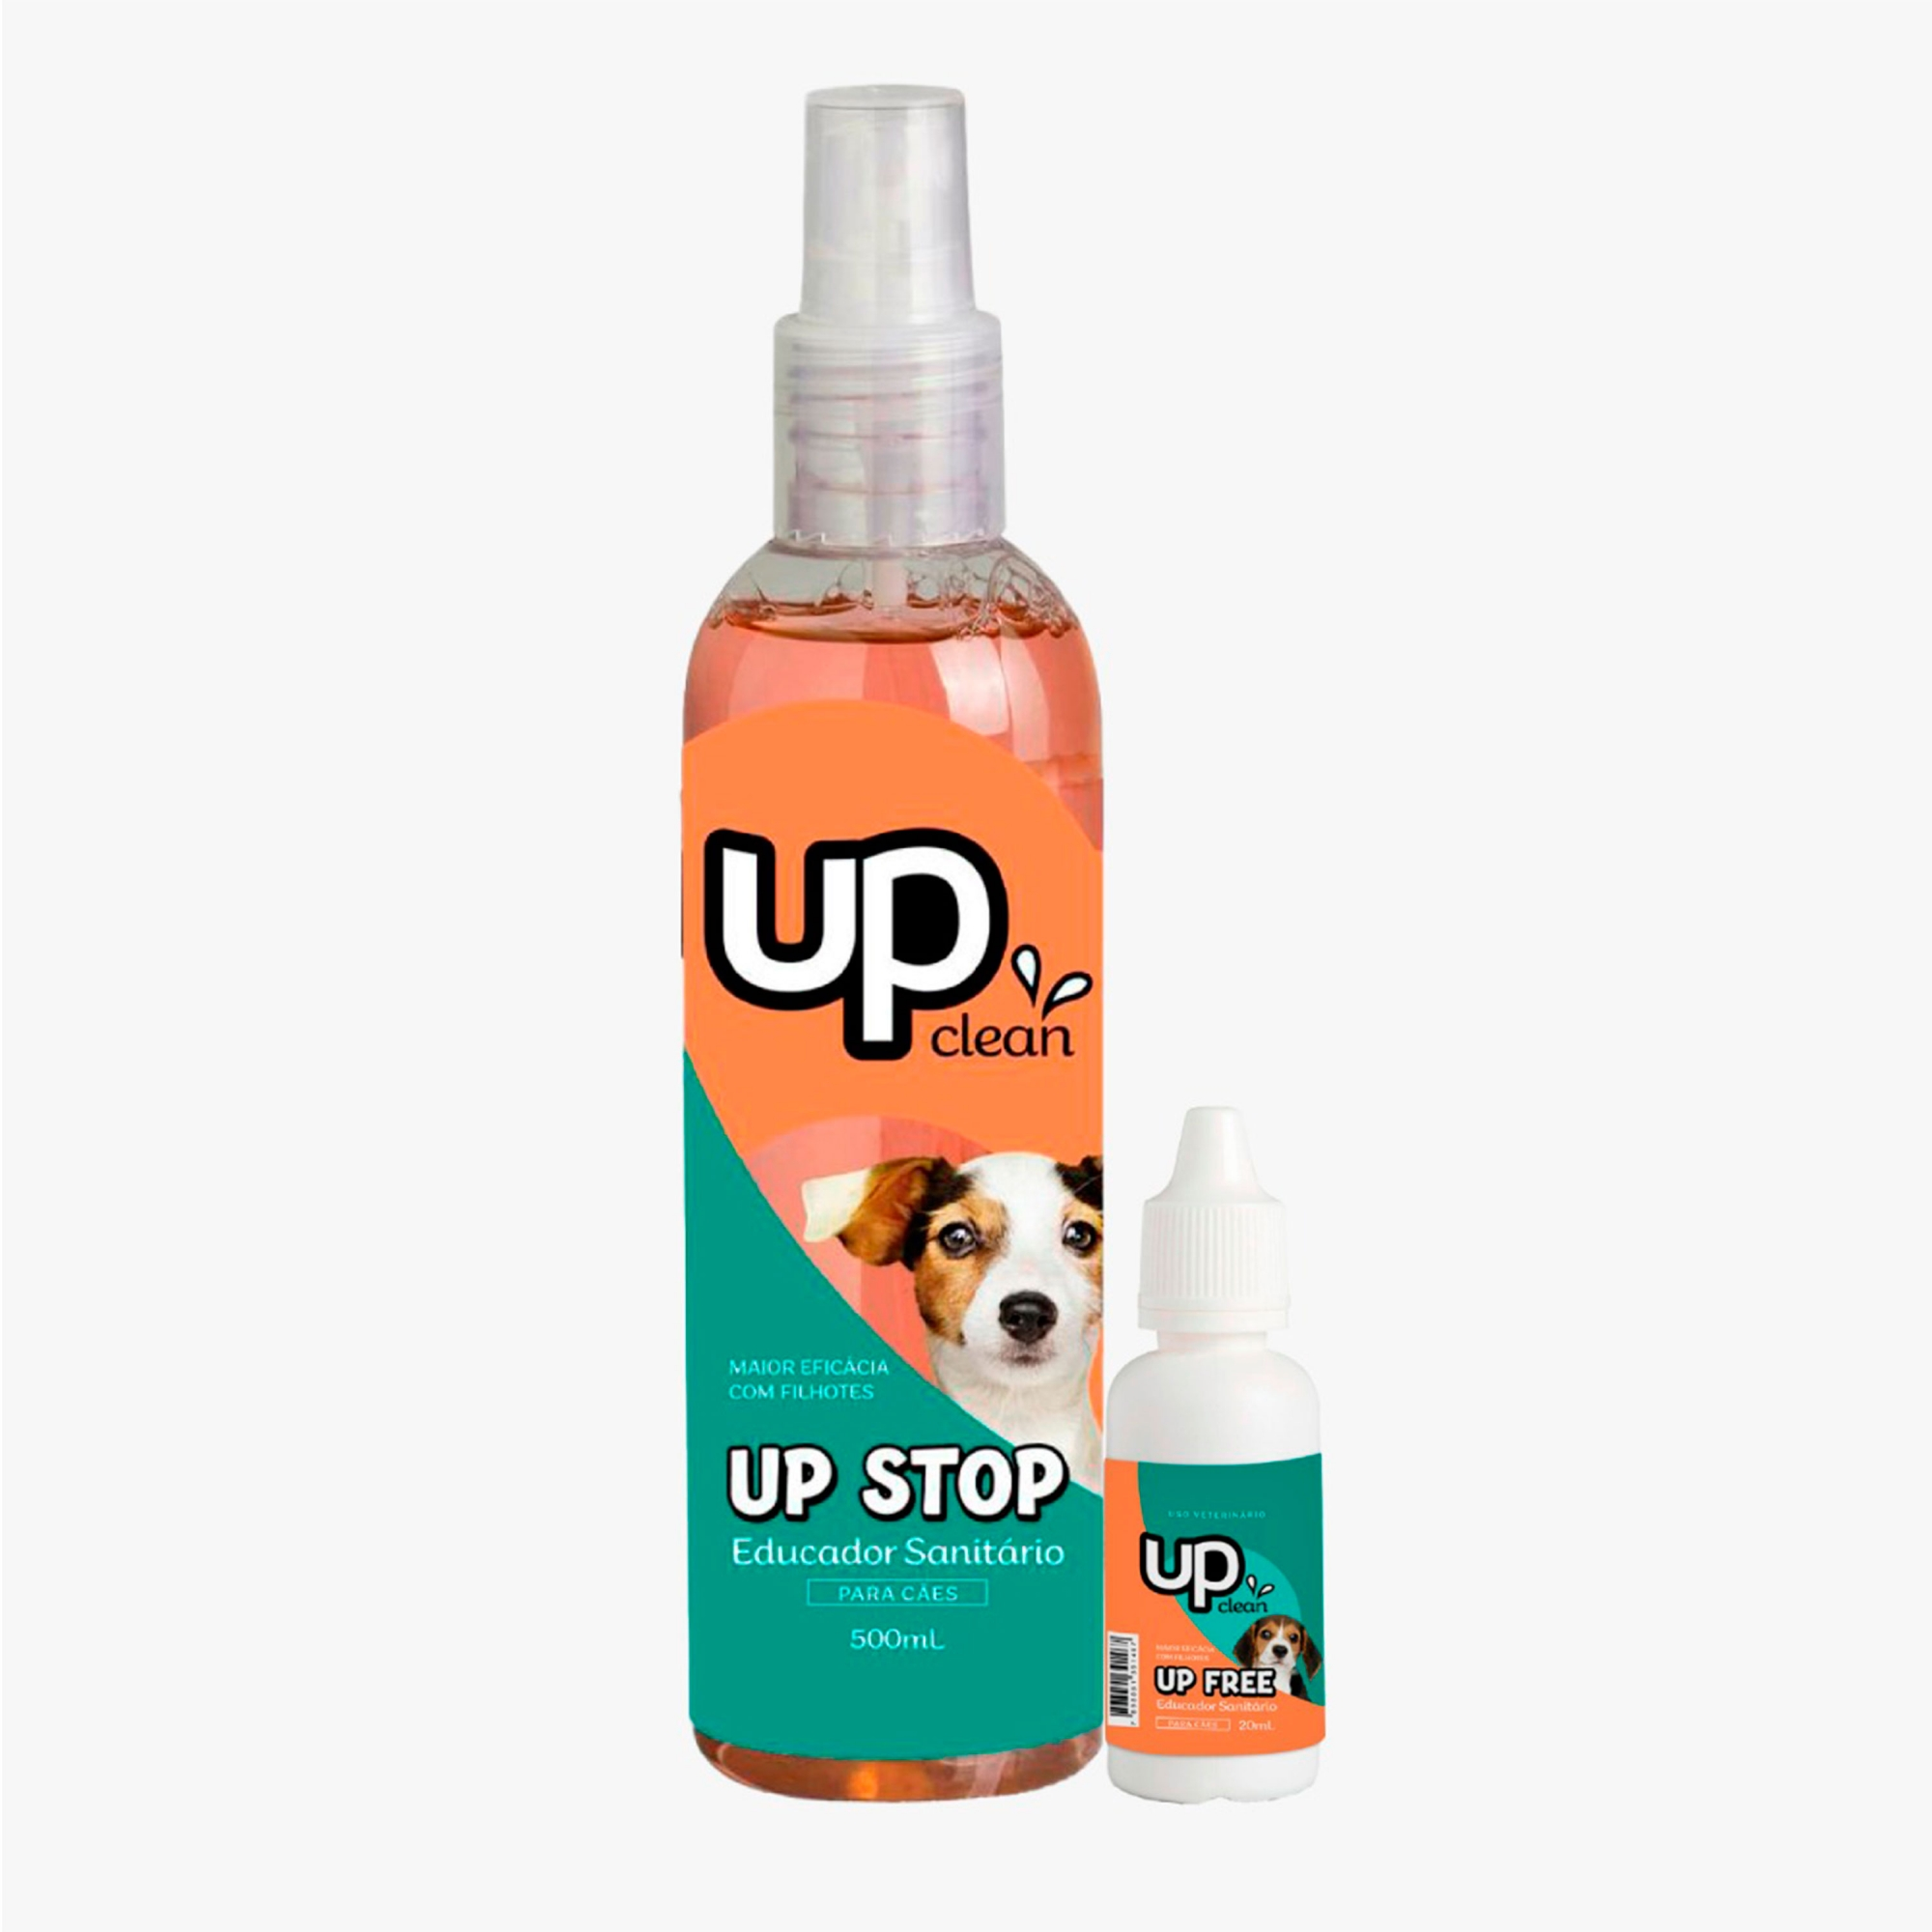 Casadinho Up Clean - Up Stop de 500ml / Up Free 20ml